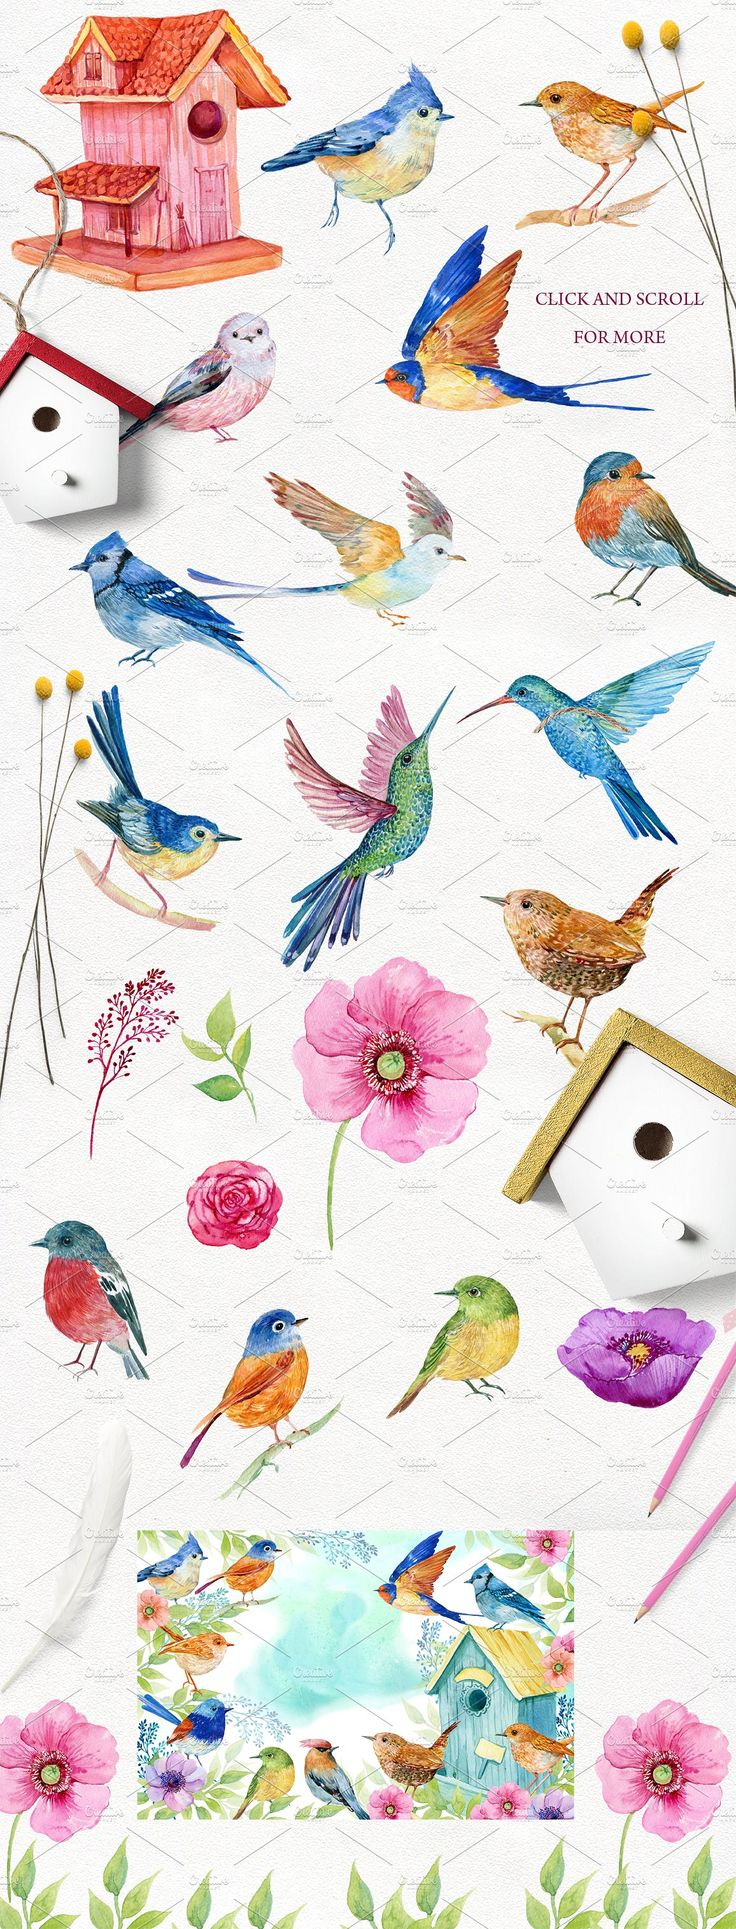 30 little birds.watercolor by MitrushovaArt on @creativemarket